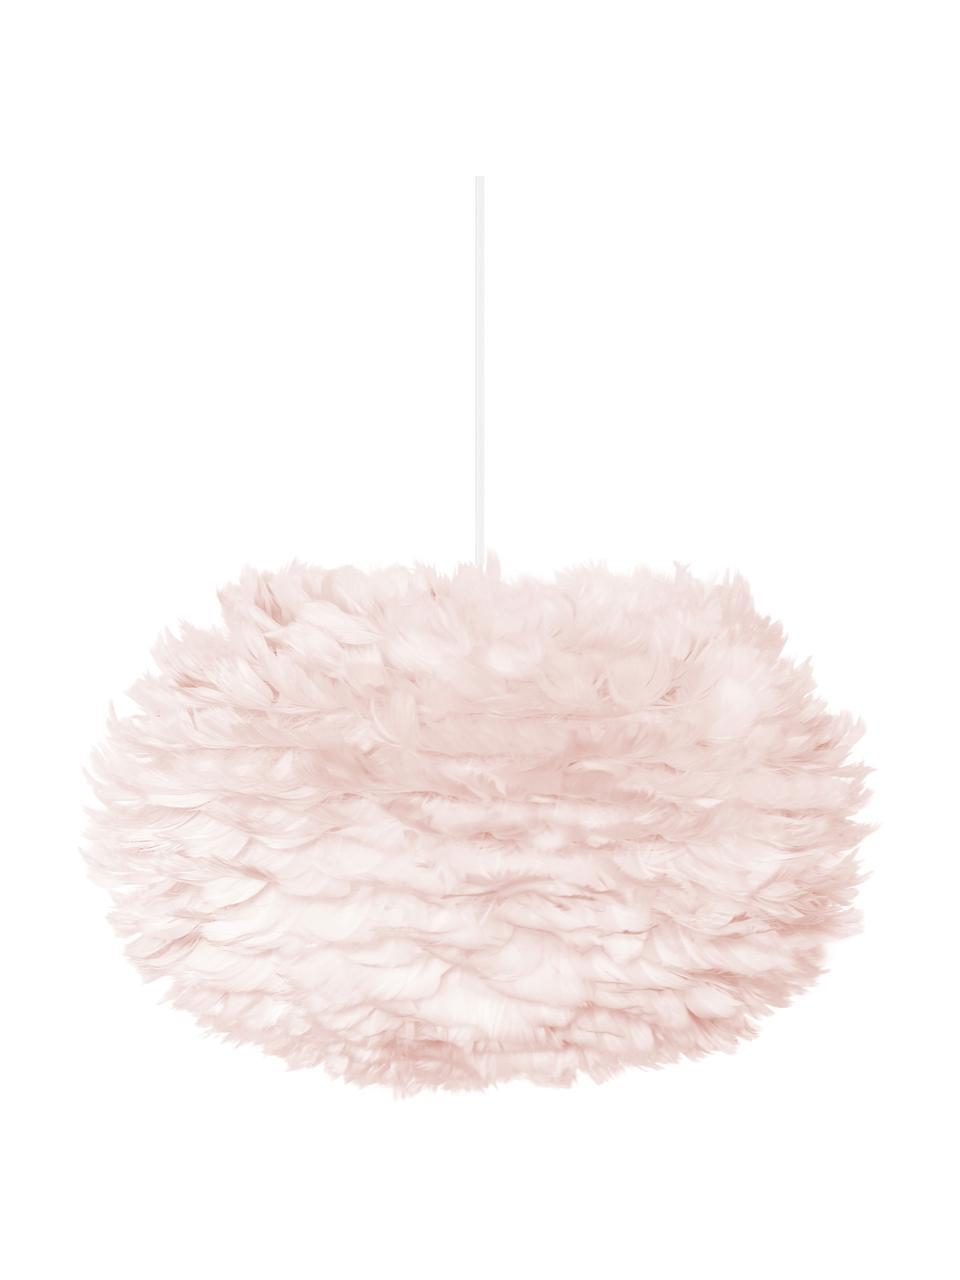 Lampada a sospensione in piume EOS, Paralume: piume d'oca, tessuto, Baldacchino: polipropilene, Rosa chiaro, Ø 45 x Alt. 30 cm